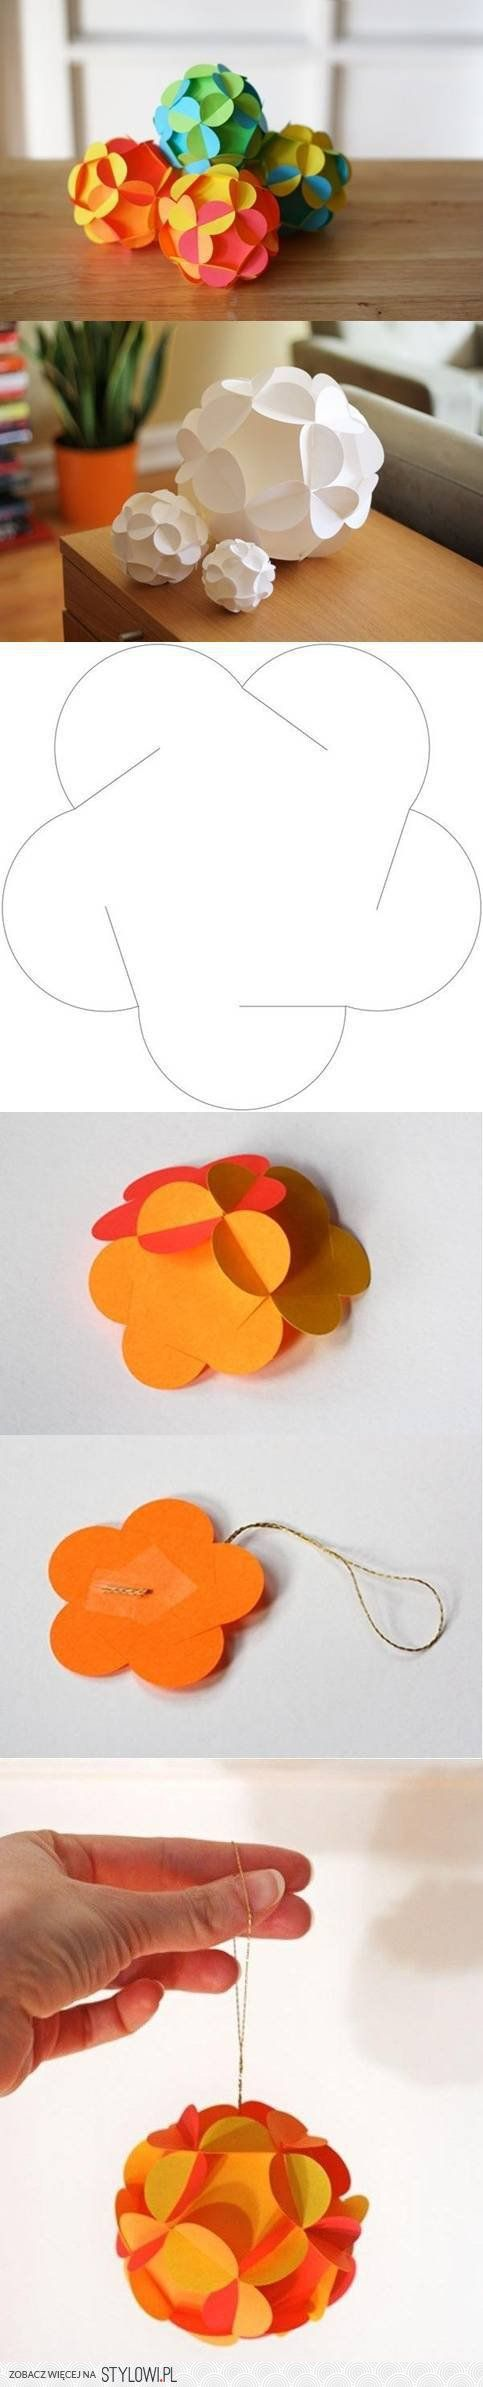 DIY Paper Christmas Balls DIY Projects | UsefulDIY.com